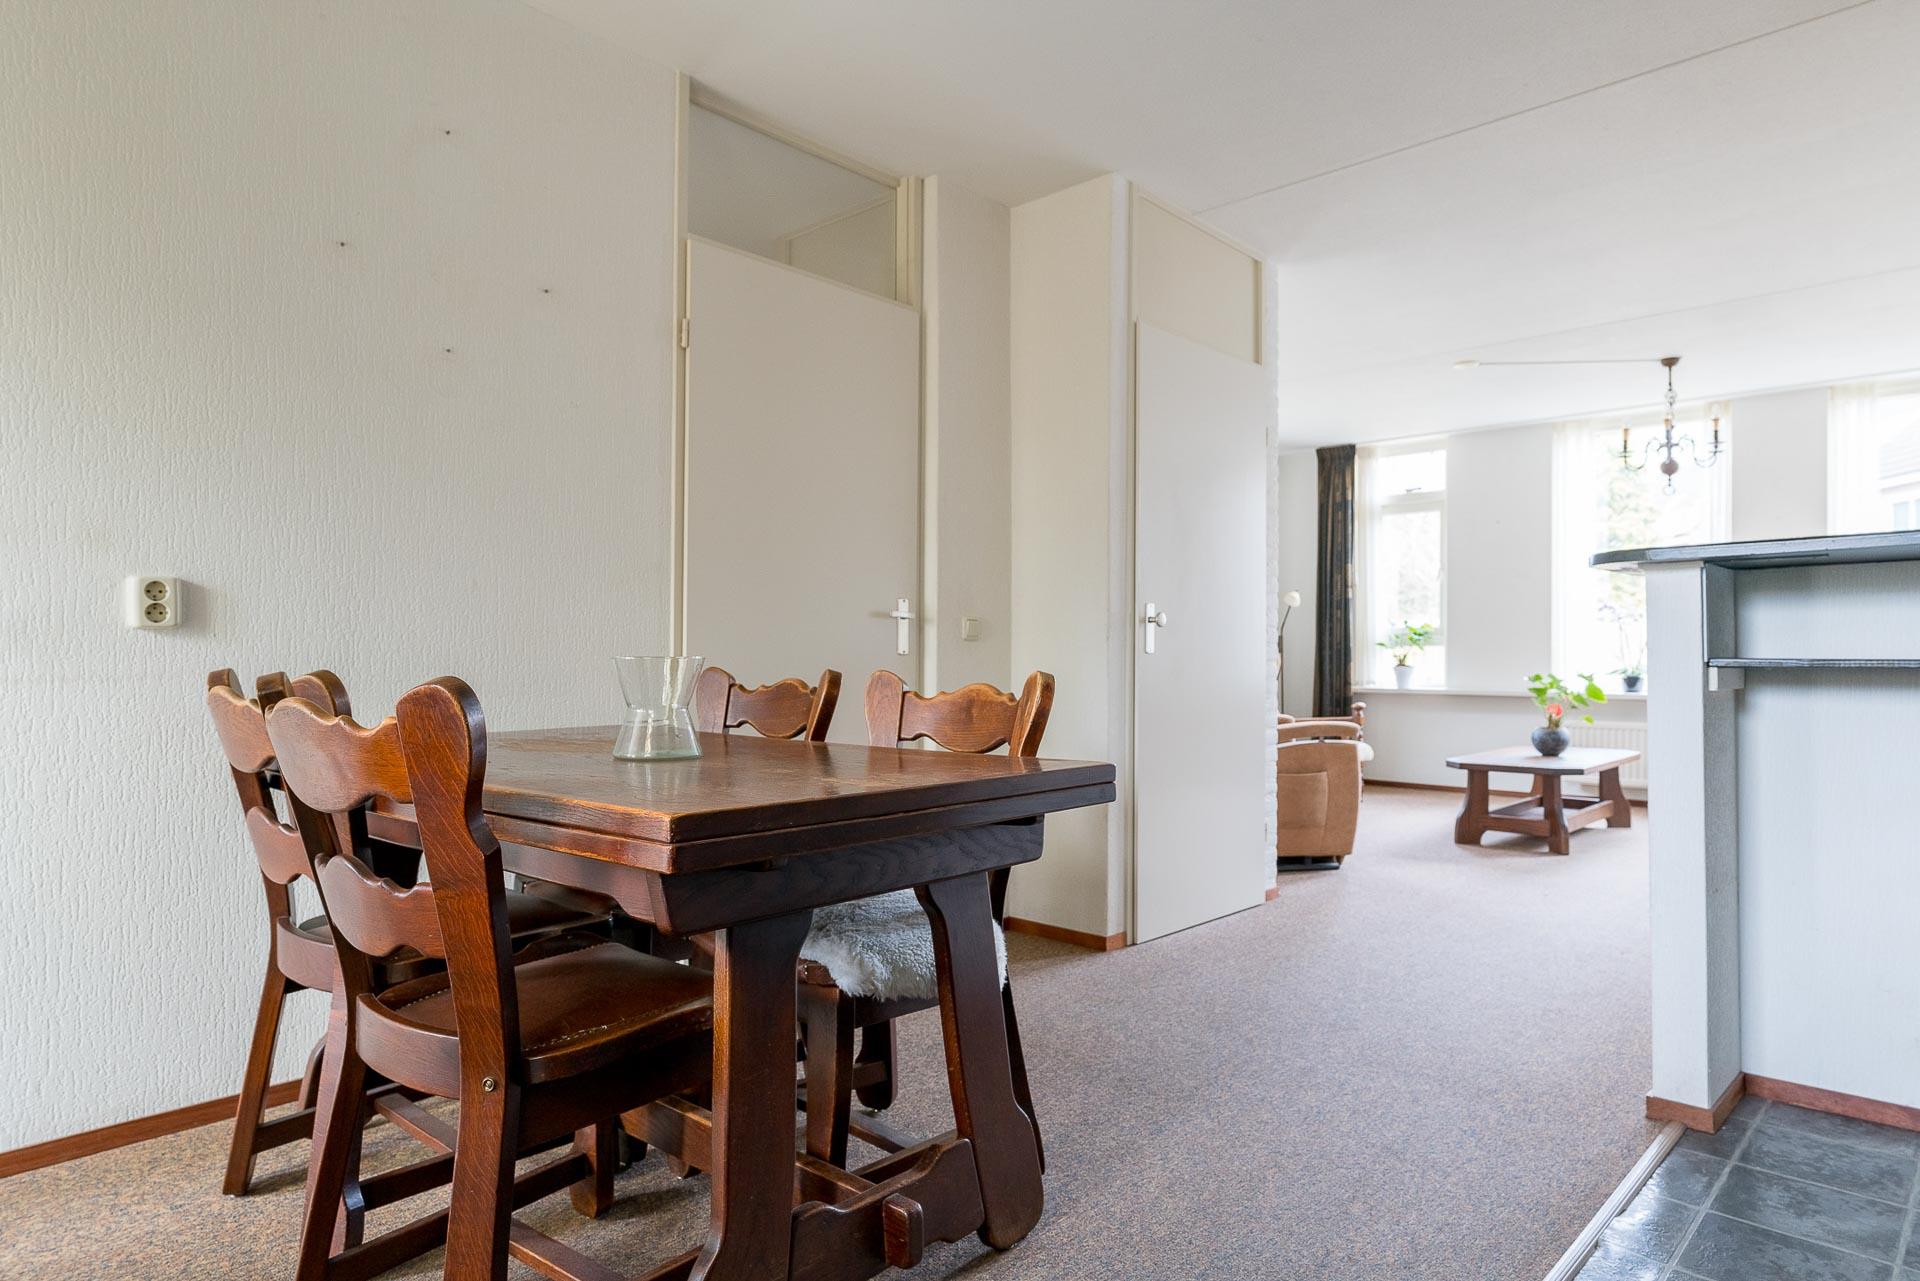 Steffensberg 61,Westerbork,Drenthe,1985 Bedrooms Bedrooms,5 BadkamerBadkamer,Eengezinswoning,Steffensberg,3,1063